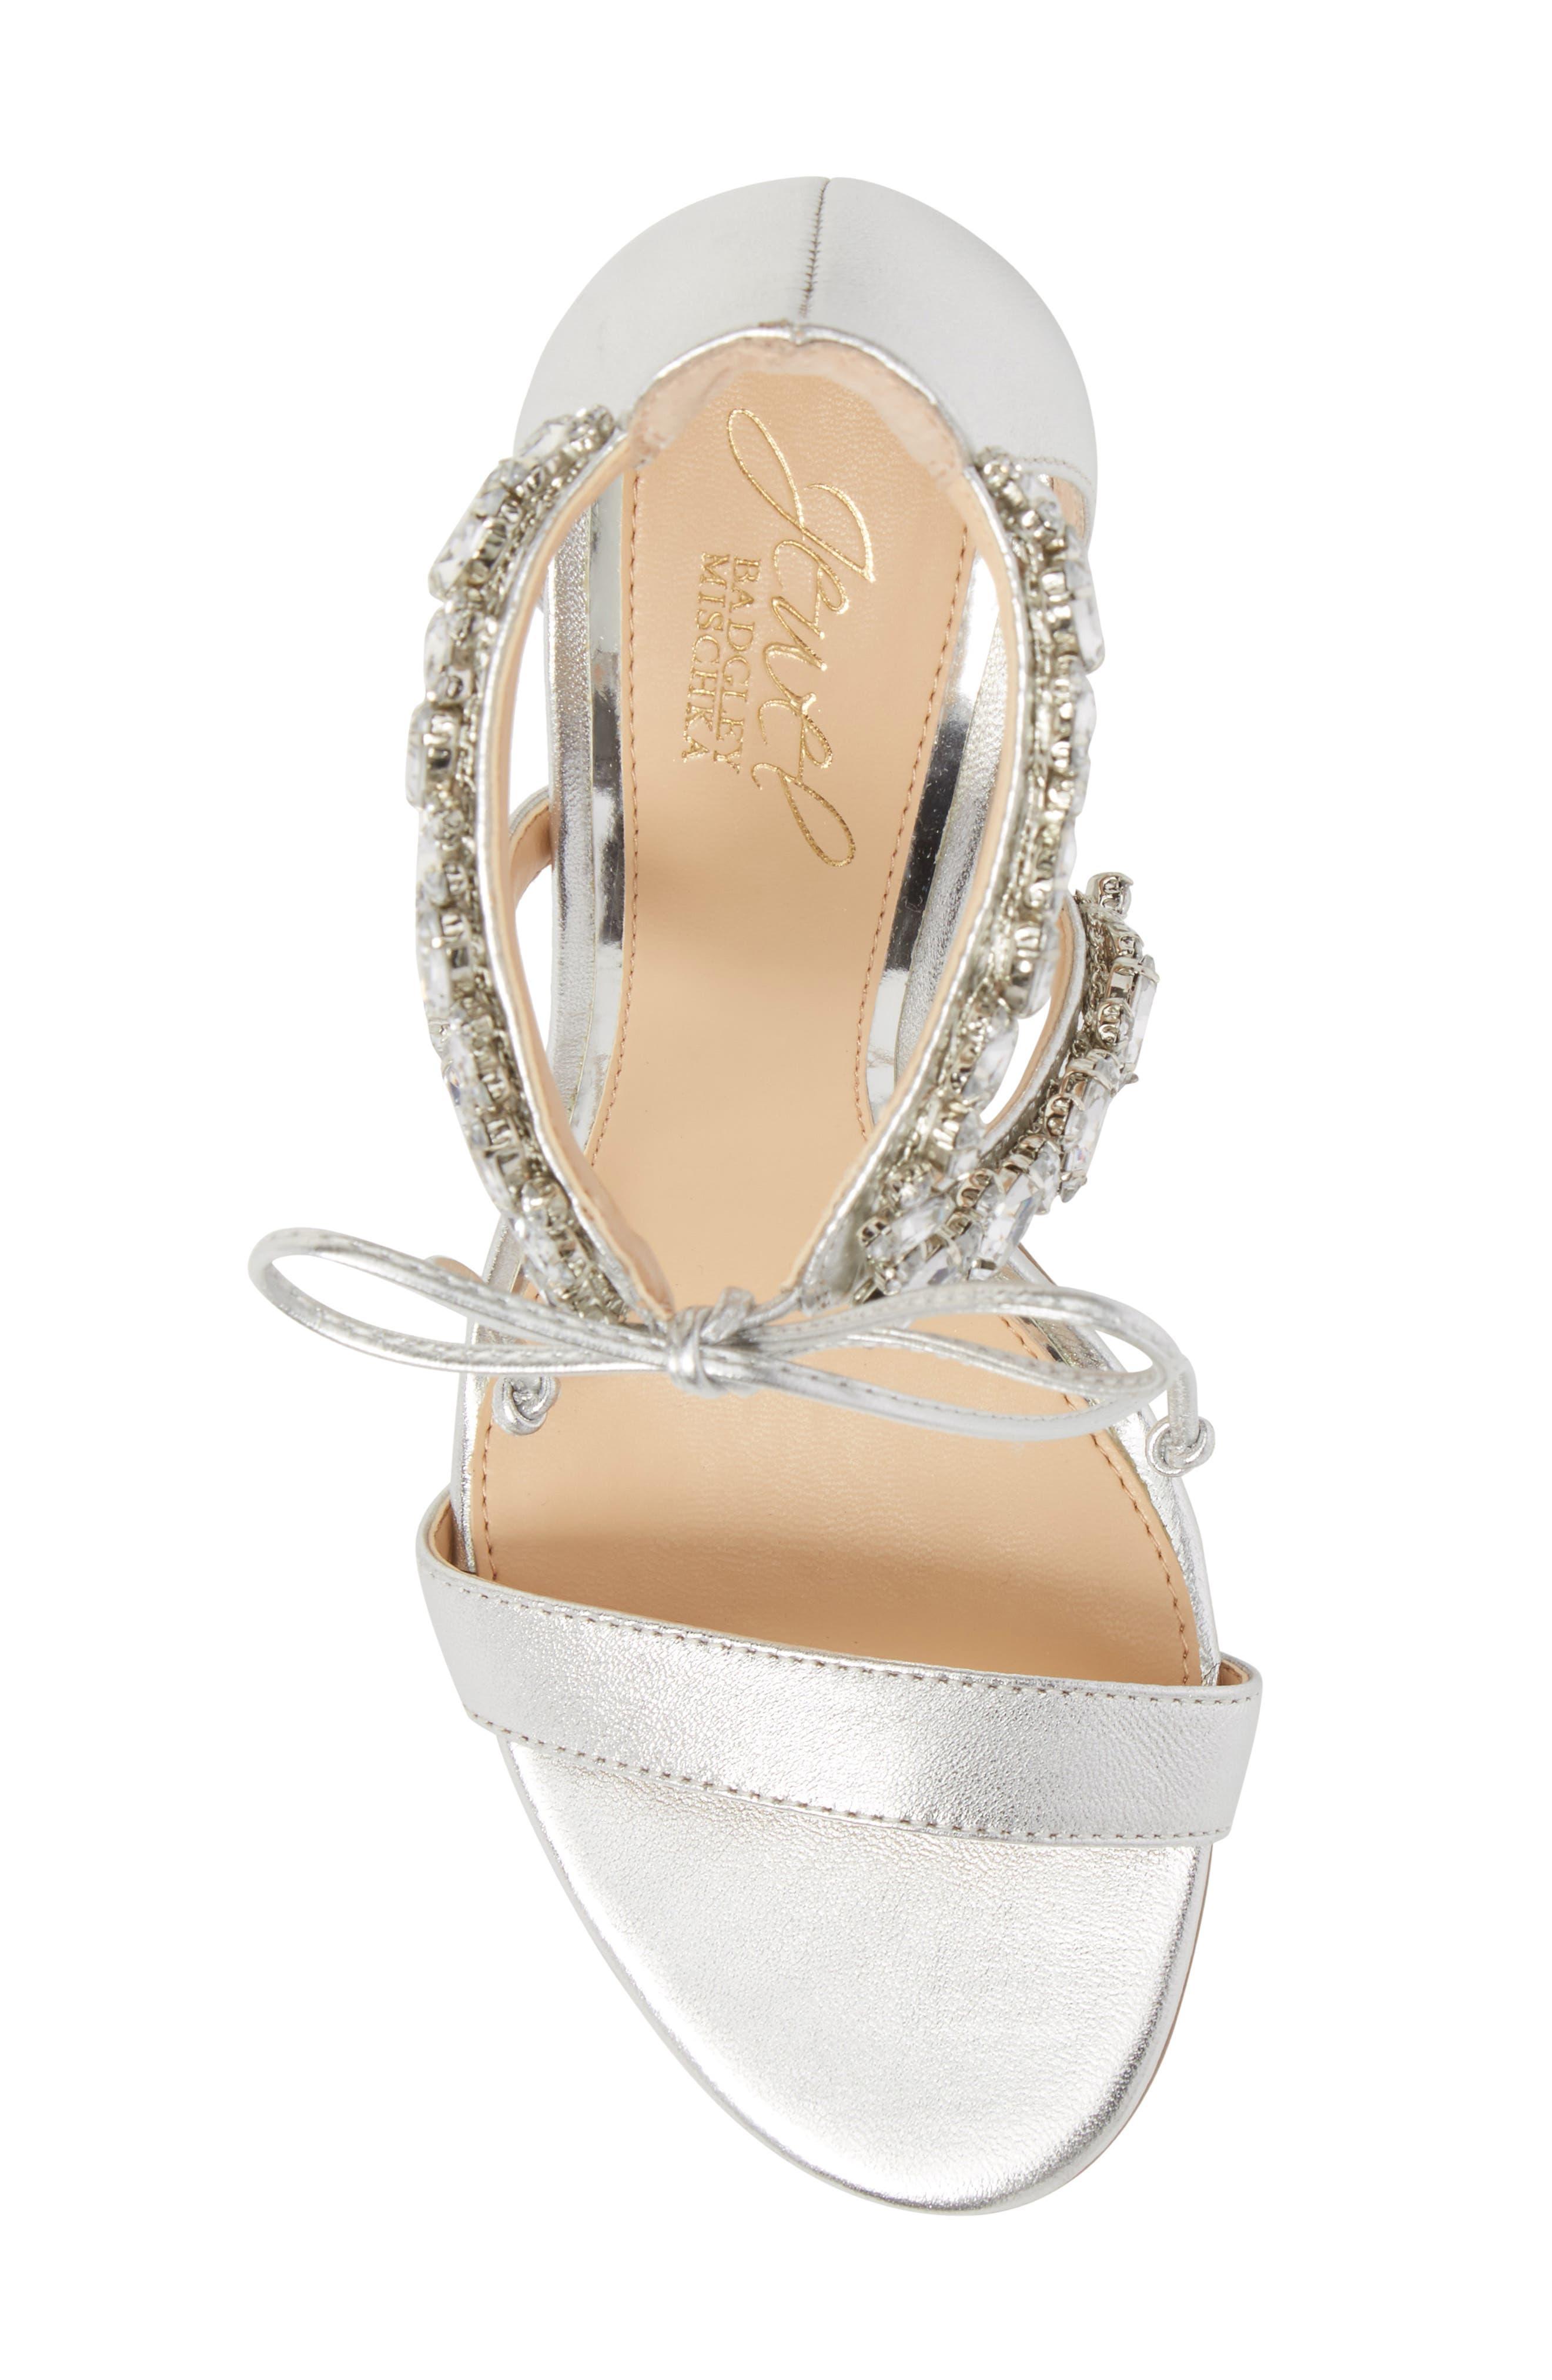 Thamar Embellished Sandal,                             Alternate thumbnail 5, color,                             Silver Leather